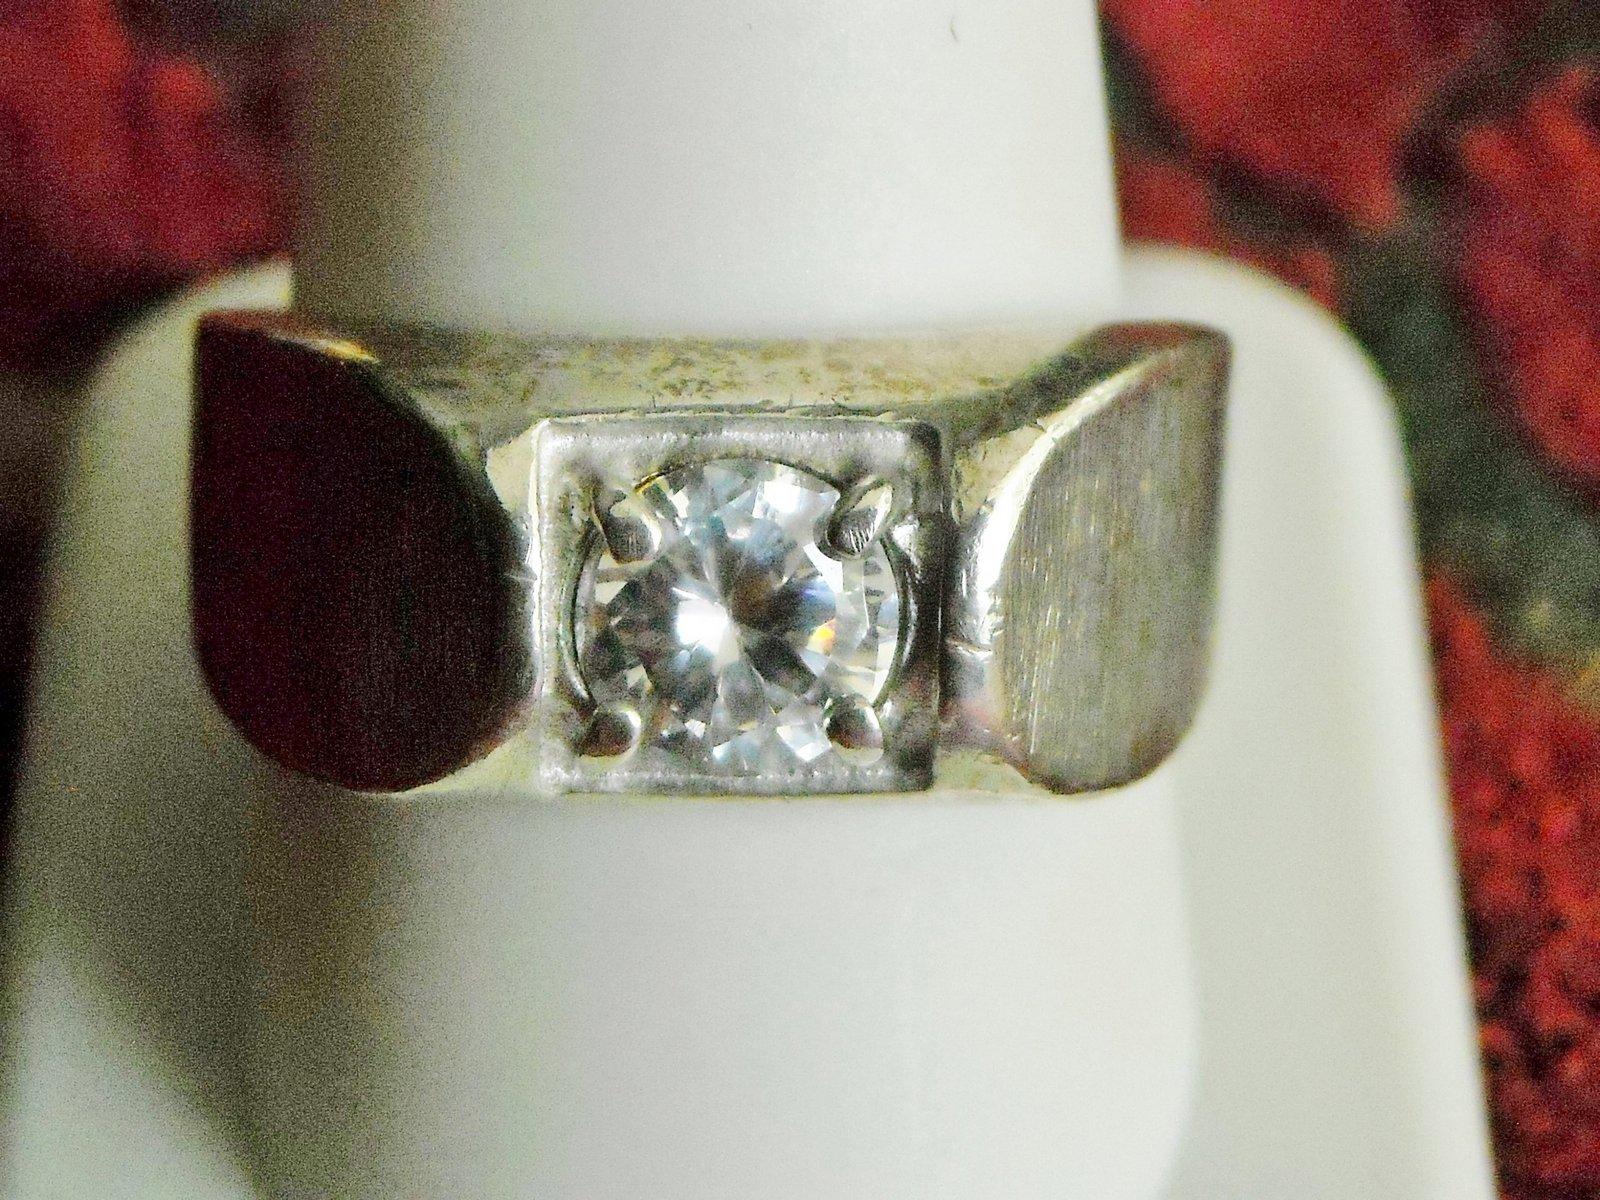 Men's Vintage UNCAS Sterling Silver Ring With Cubic Zirconia Solitare (11)